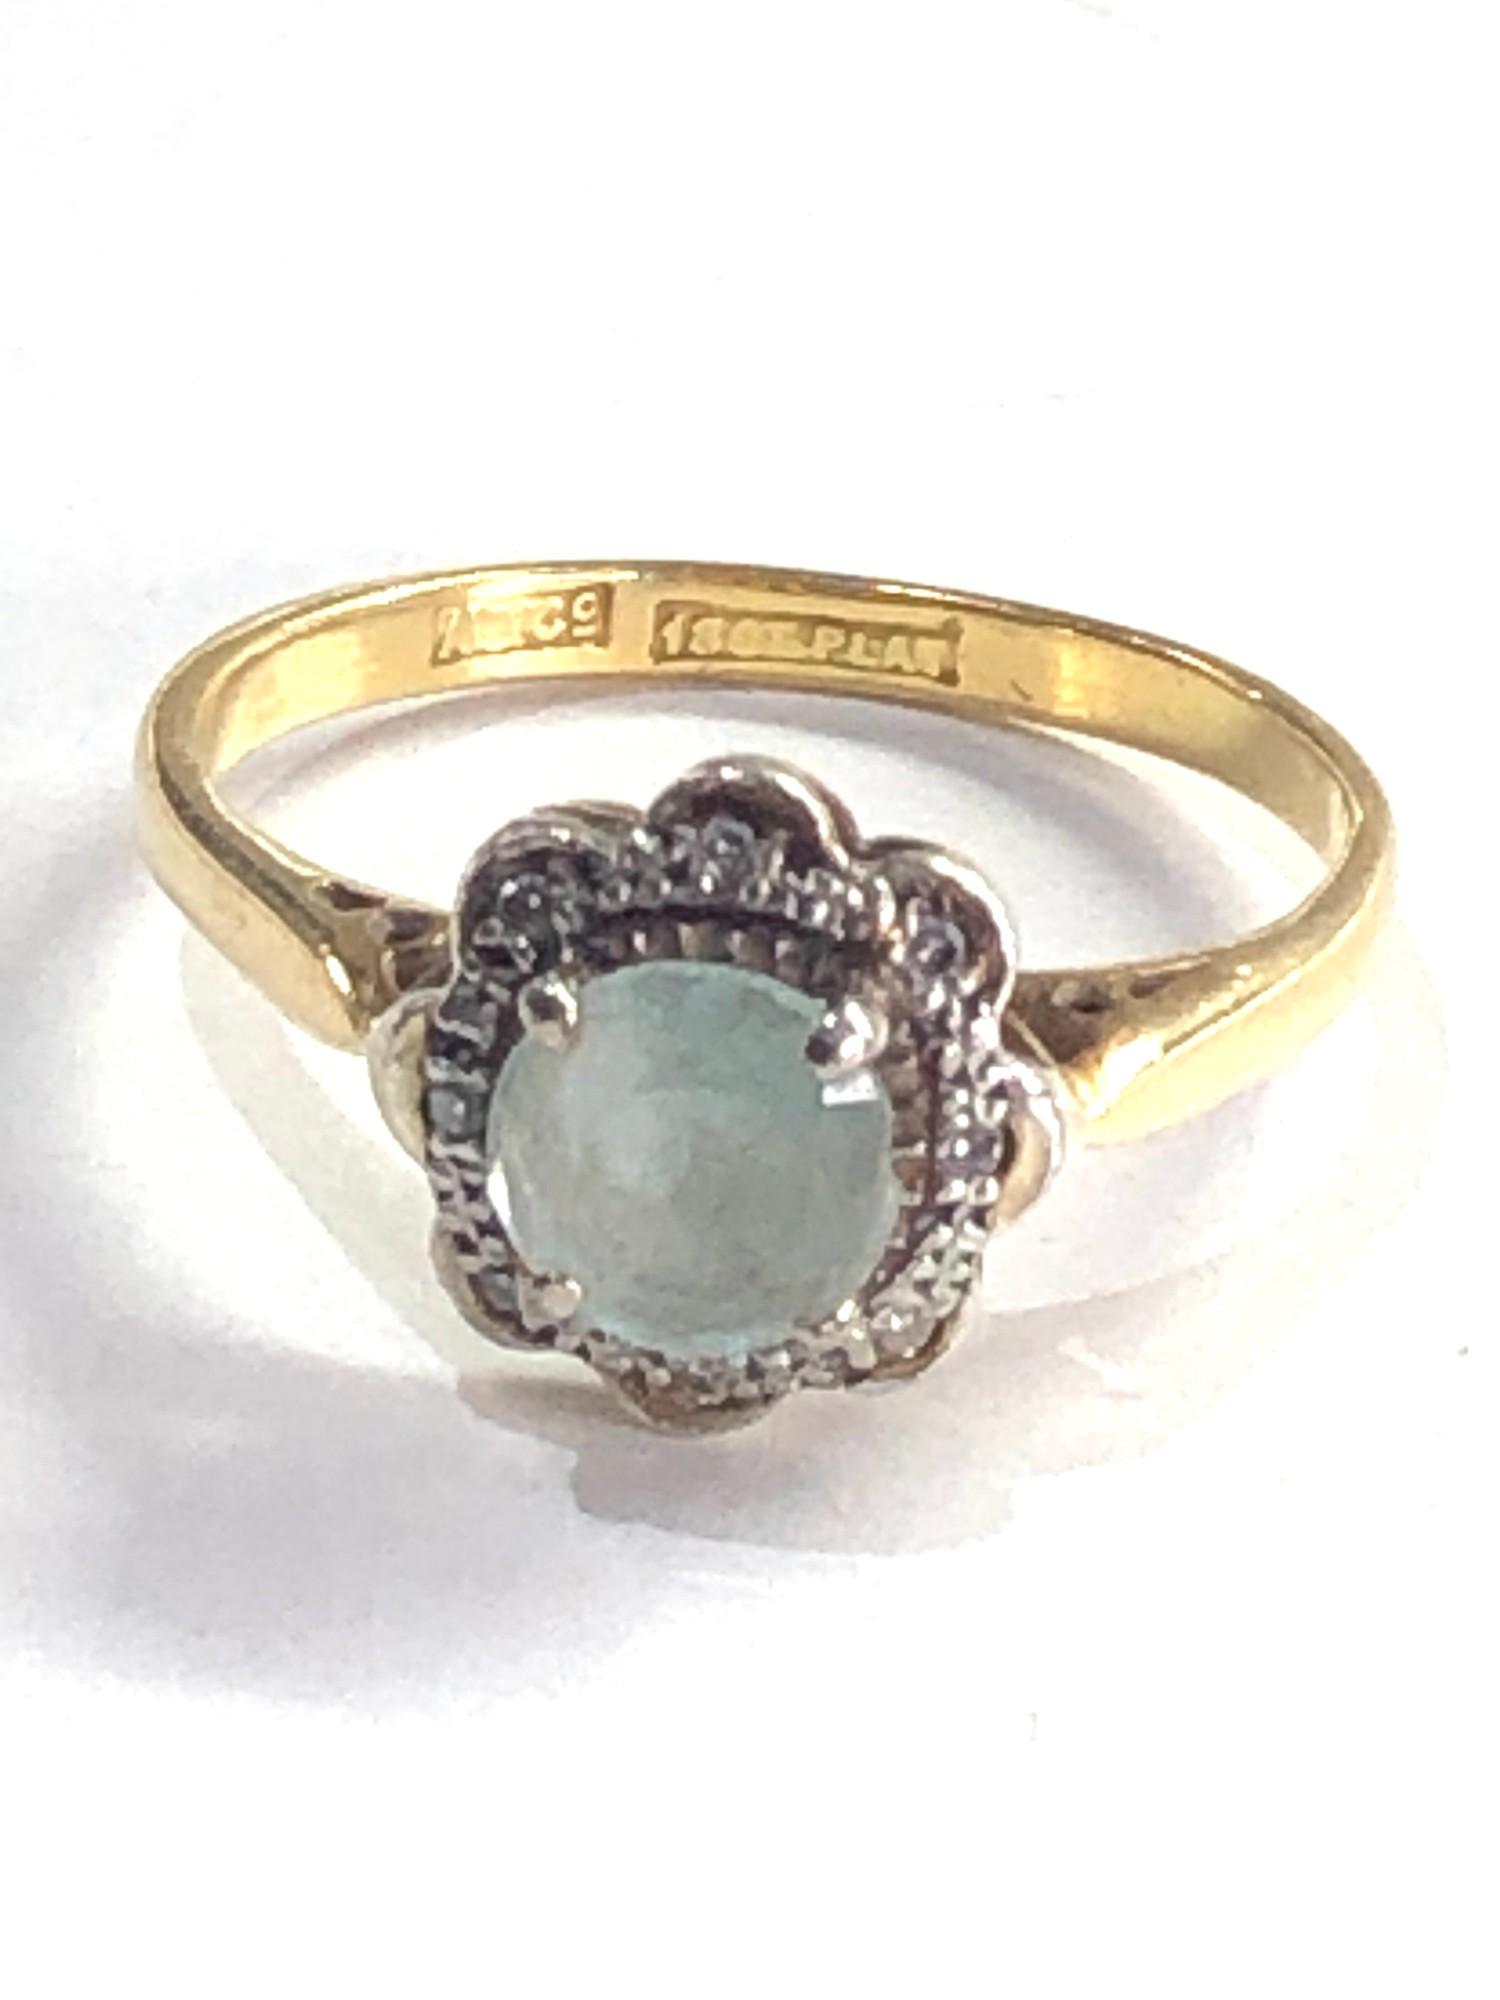 Antique 18ct gold topaz & diamond halo set ring 3.2g